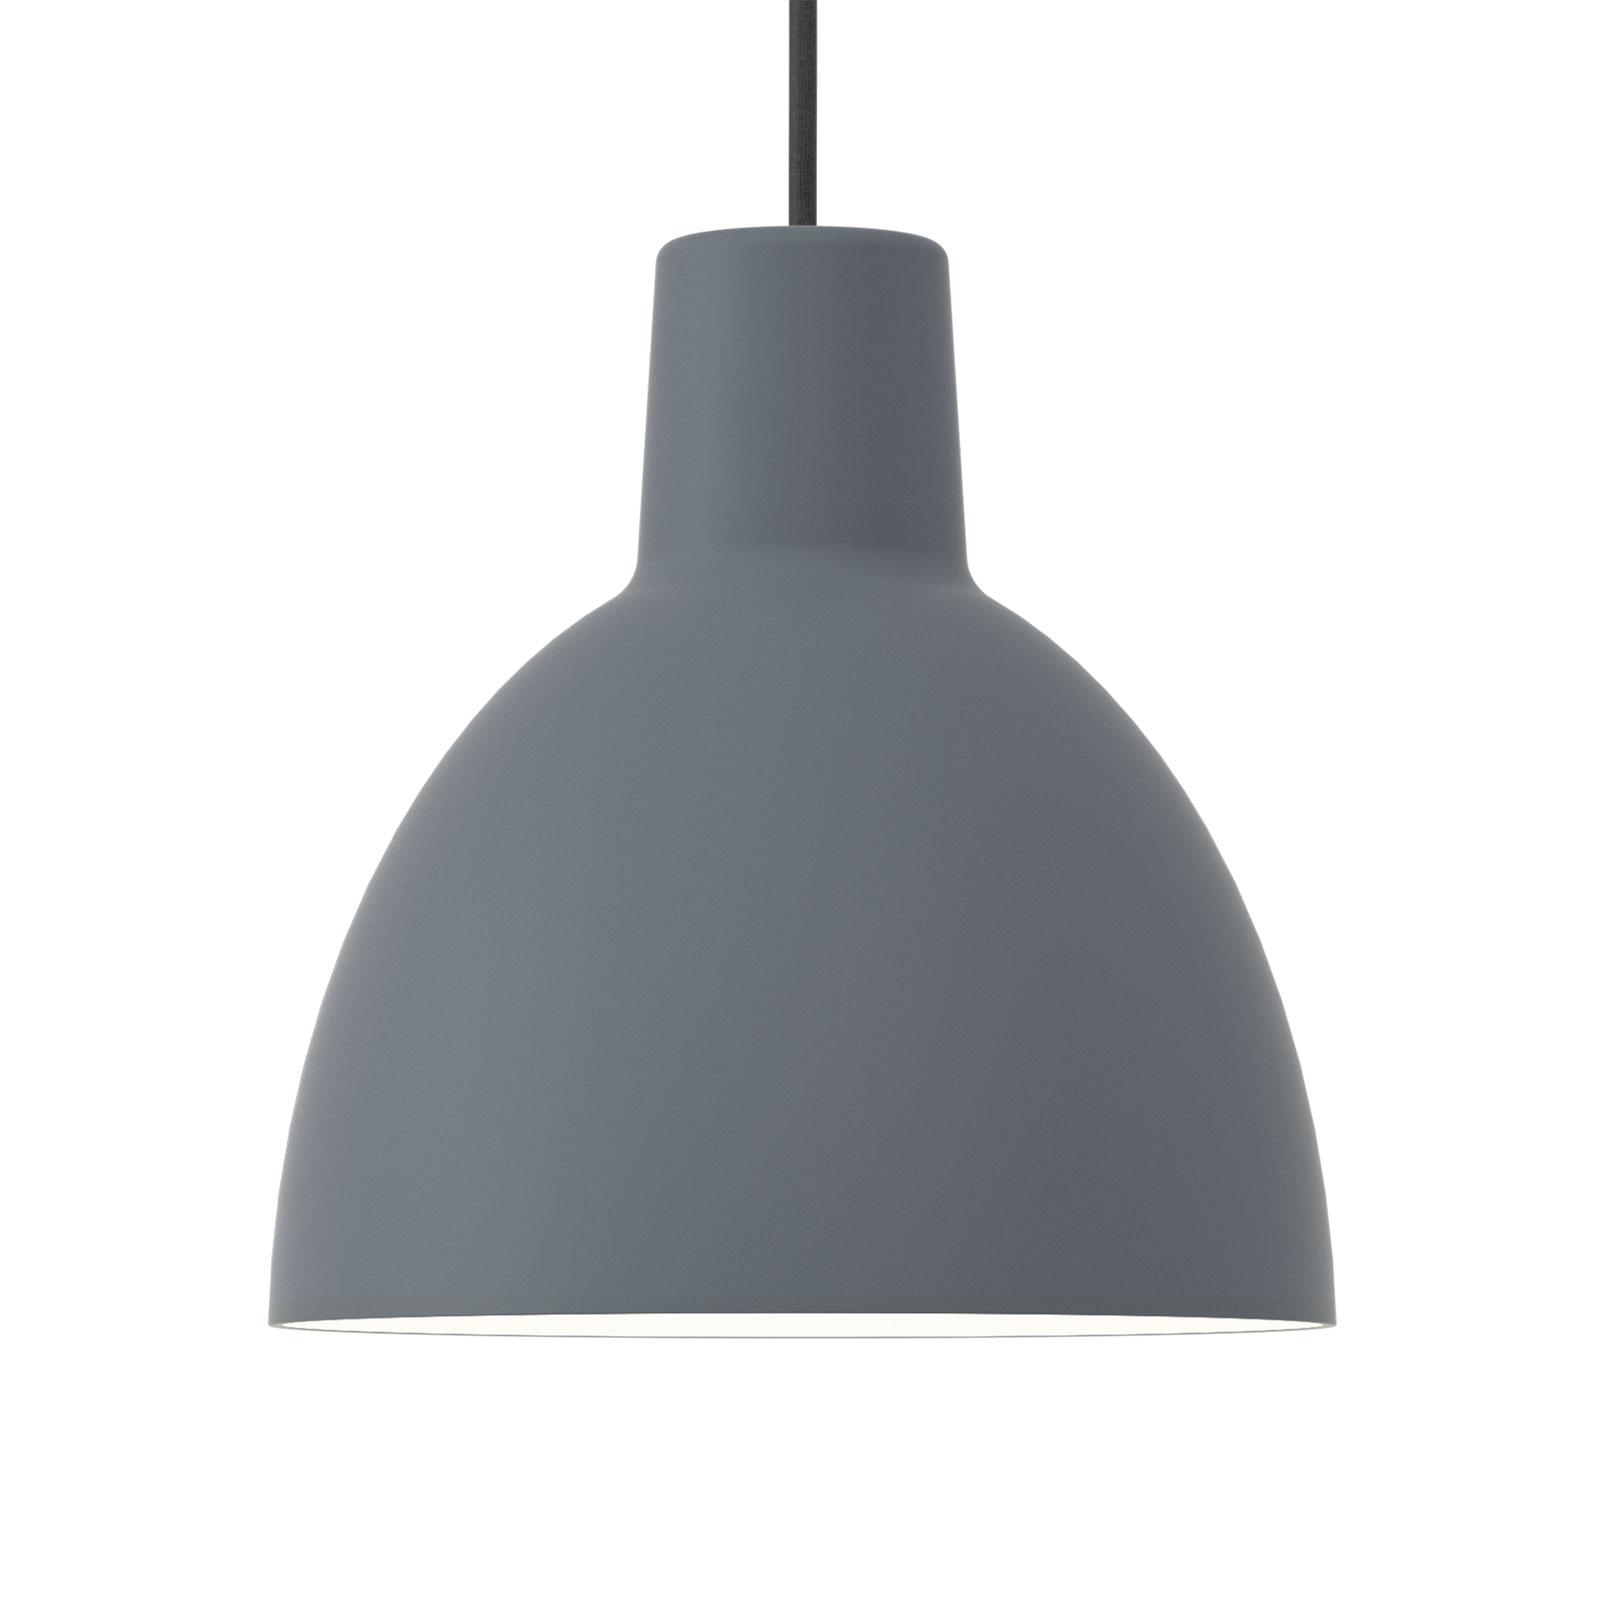 Louis Poulsen hanglamp Toldbod 250 blauwgrijs